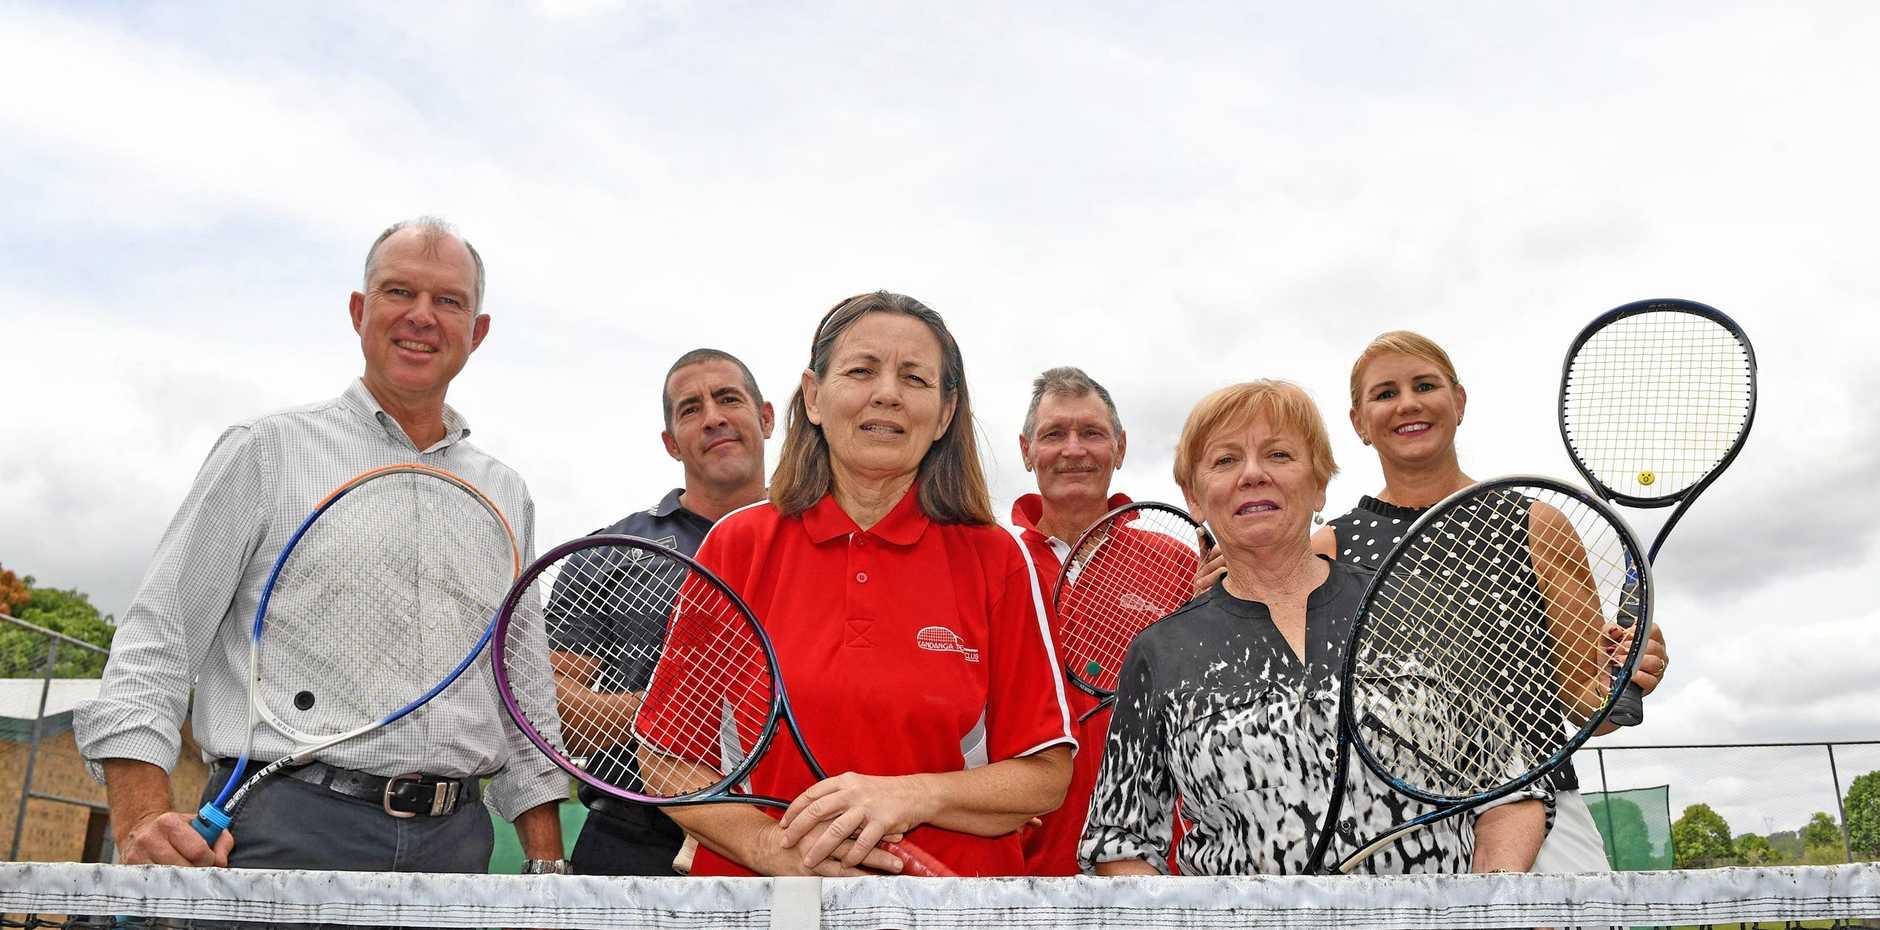 HITTING NEW HEIGHTS: Gympie MP Tony Perrett, Senior Constable Bill Greer, club treasurer Steve Banney, Michele Perrett, Margaret Gillett and Julie Worth at the Kandanga Tennis Club.